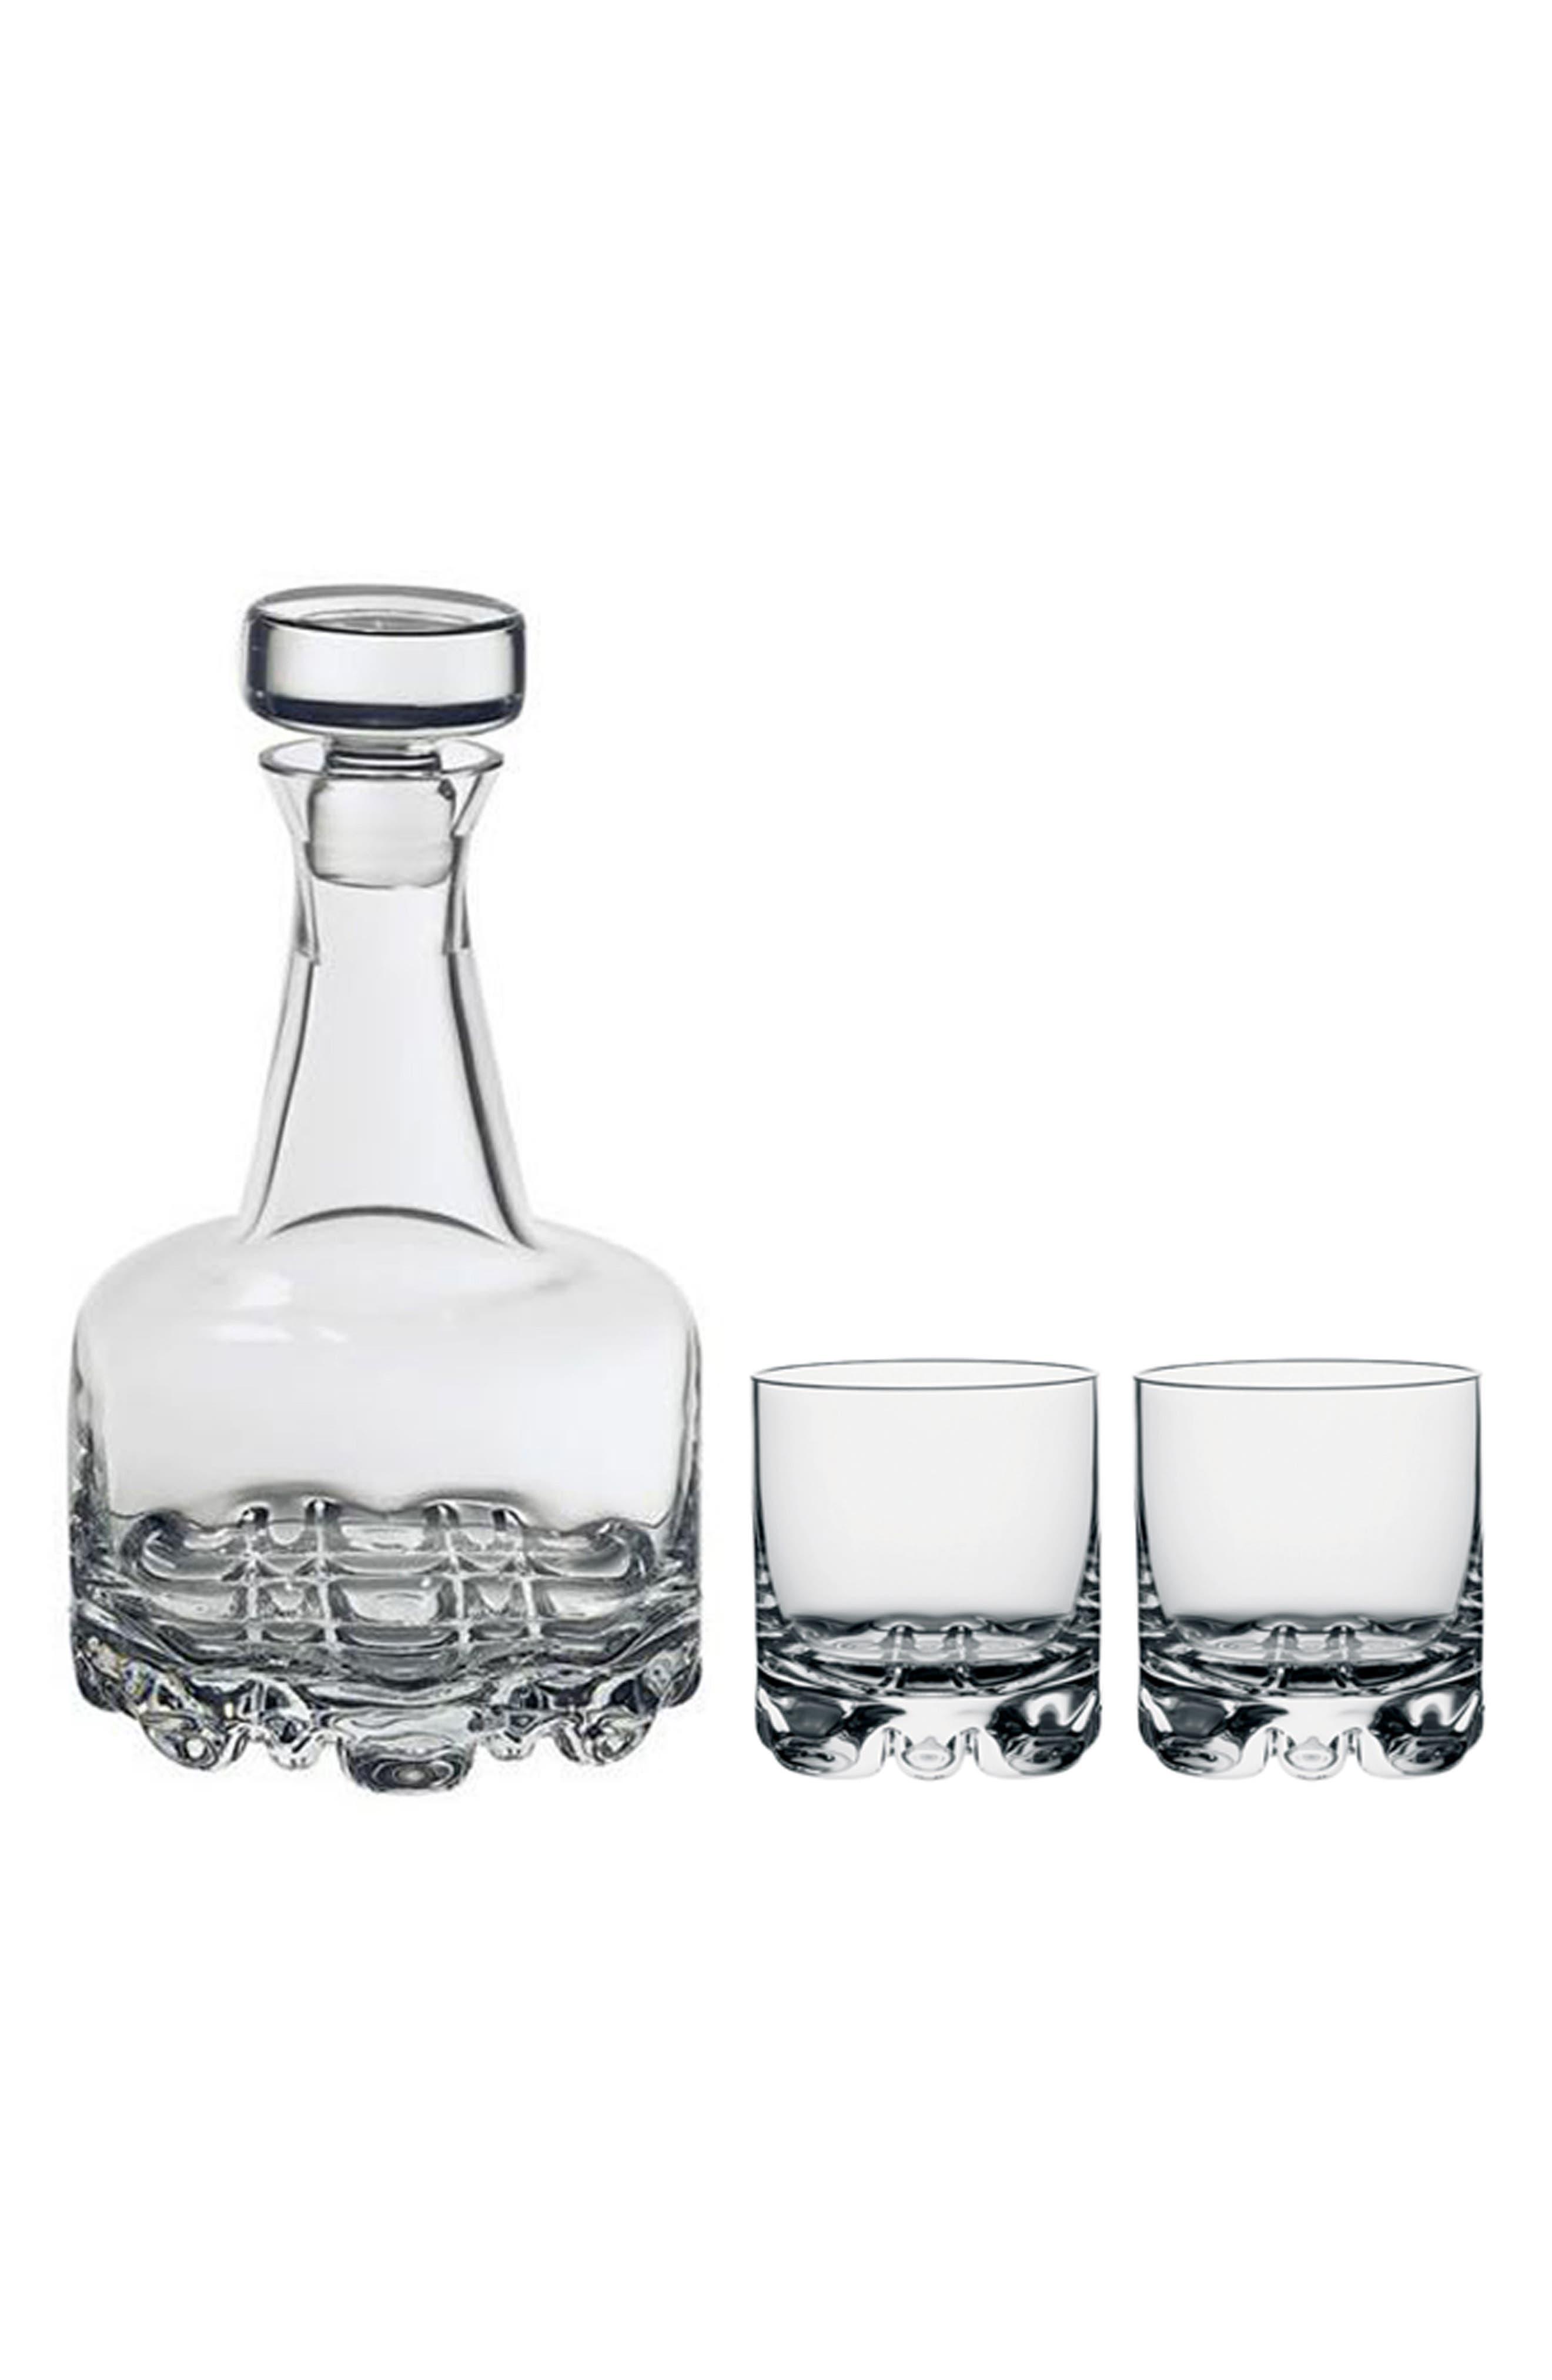 Orrefors Erik 3-Piece Whiskey Decanter Set